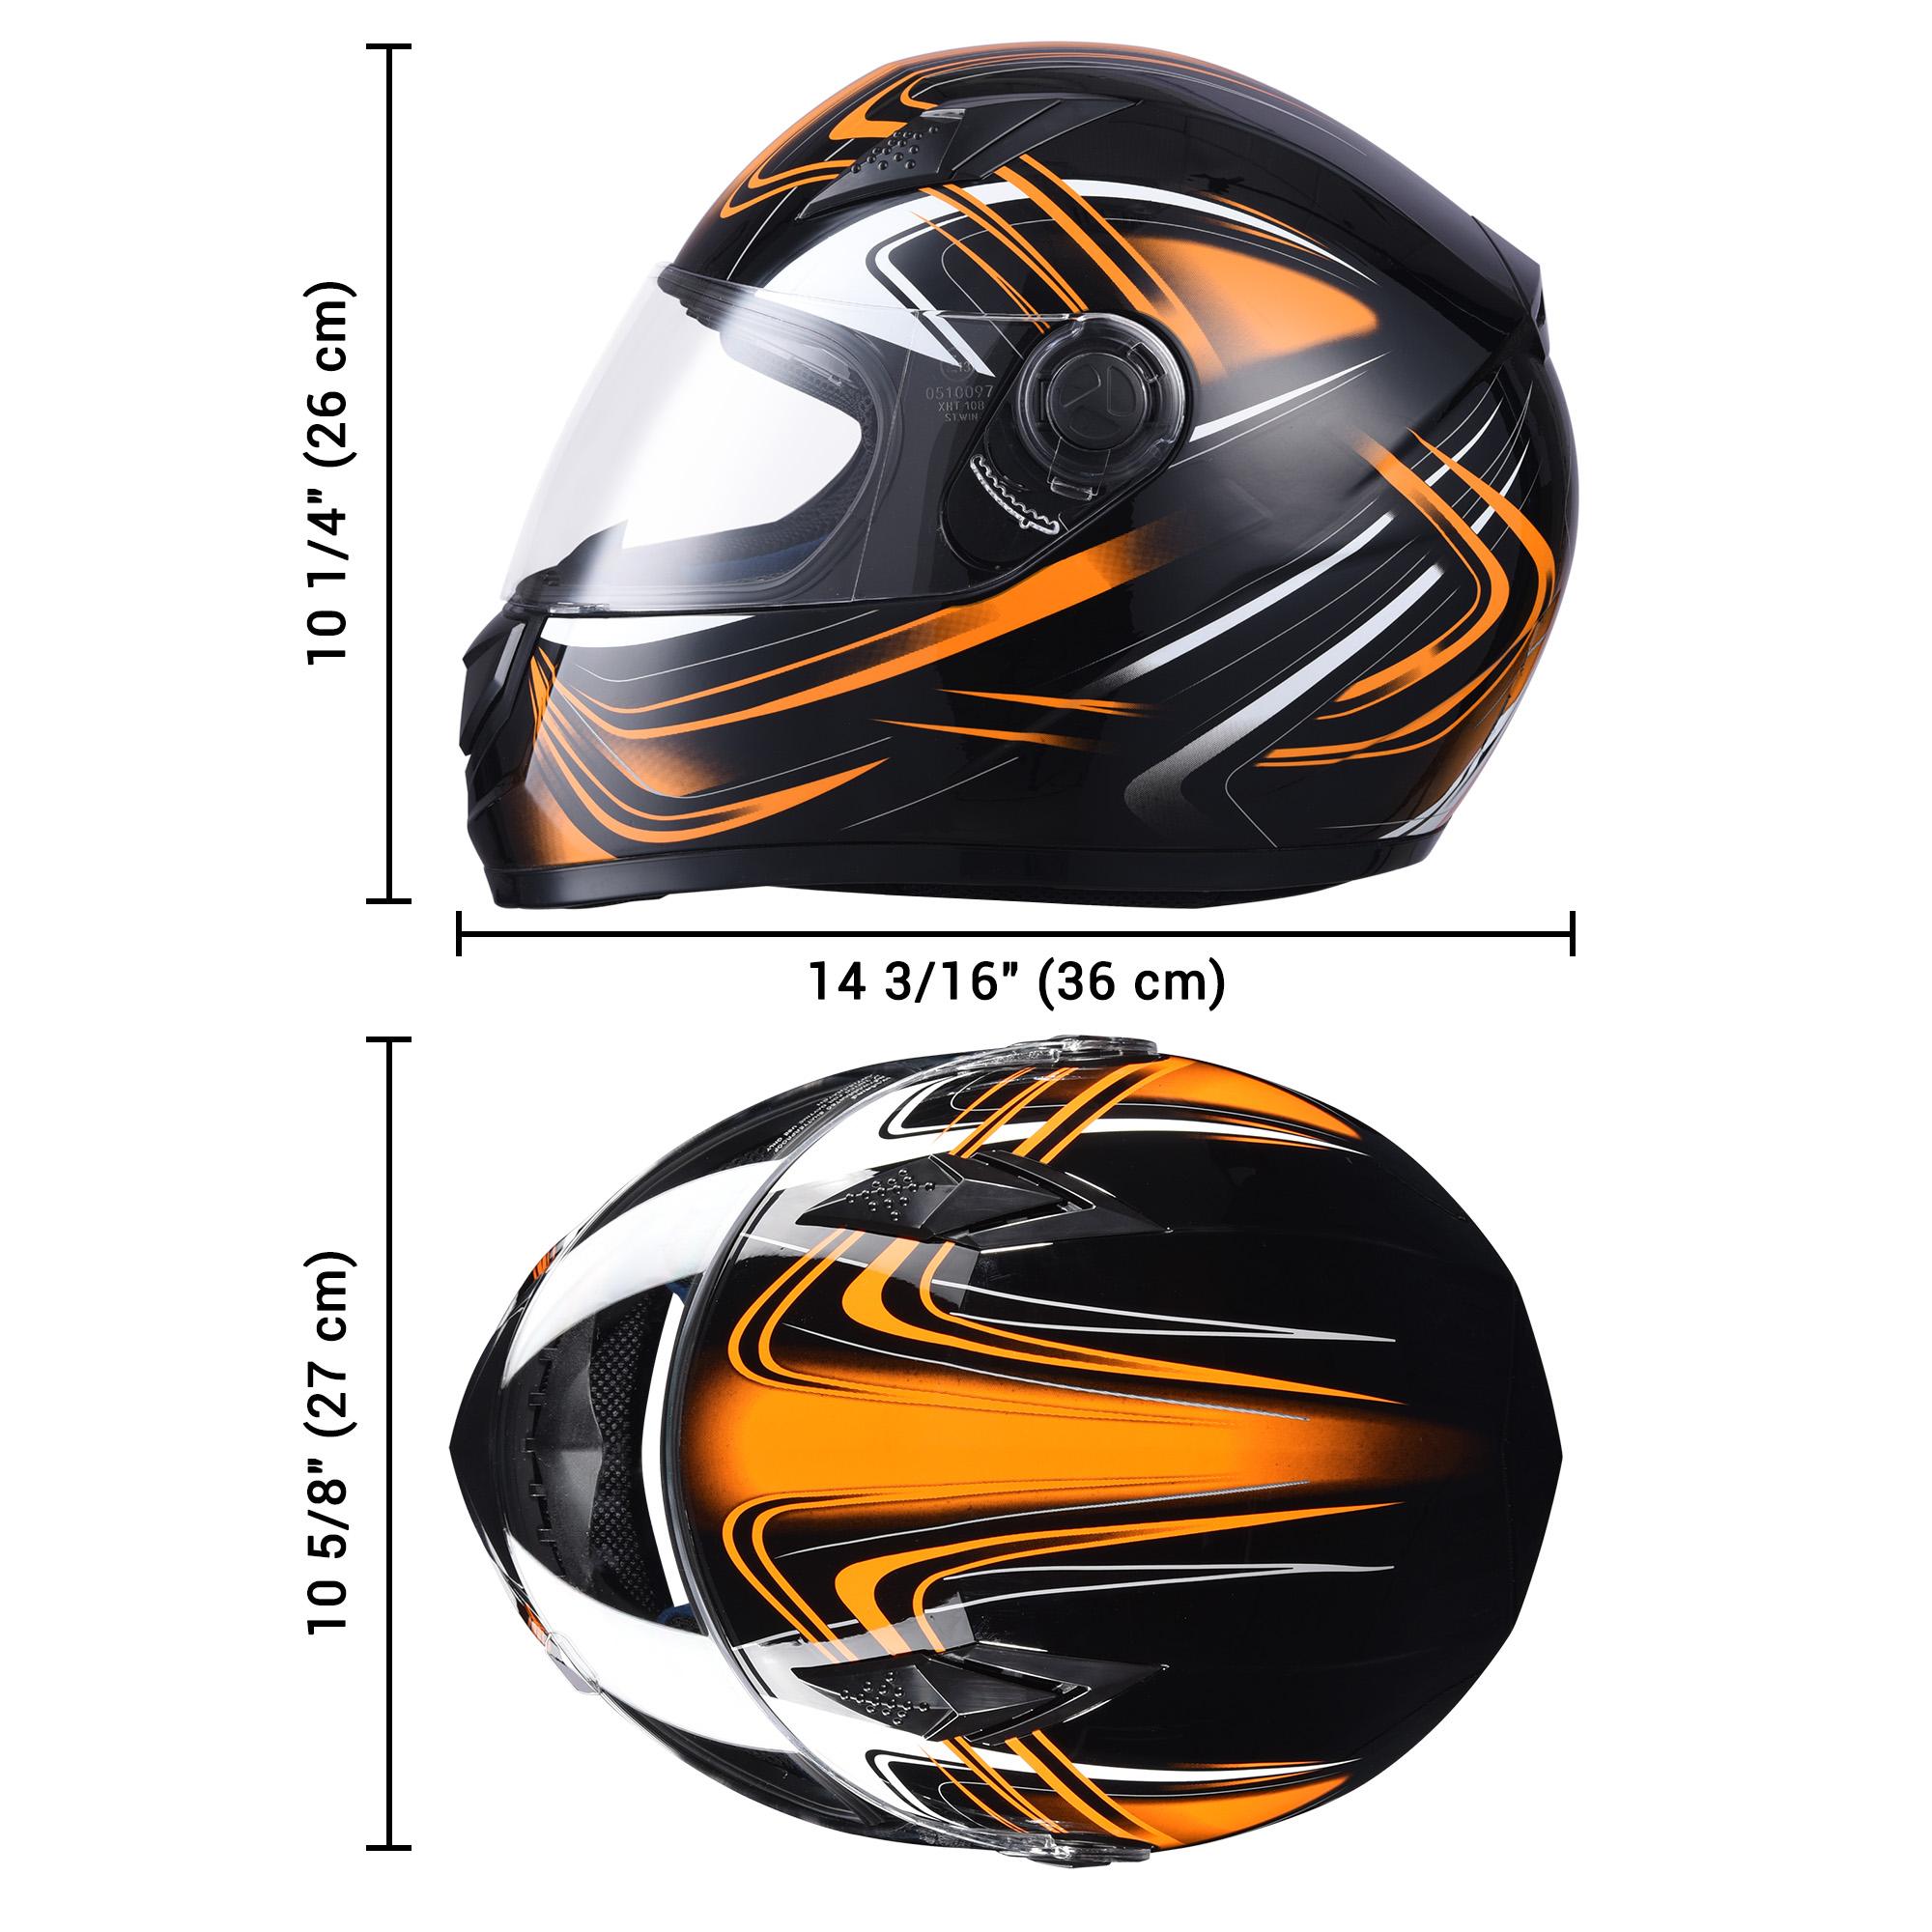 miniature 118 - AHR K12 Full Face Motorcycle Helmet DOT Air Vents Clear Visor Racing S M L XL